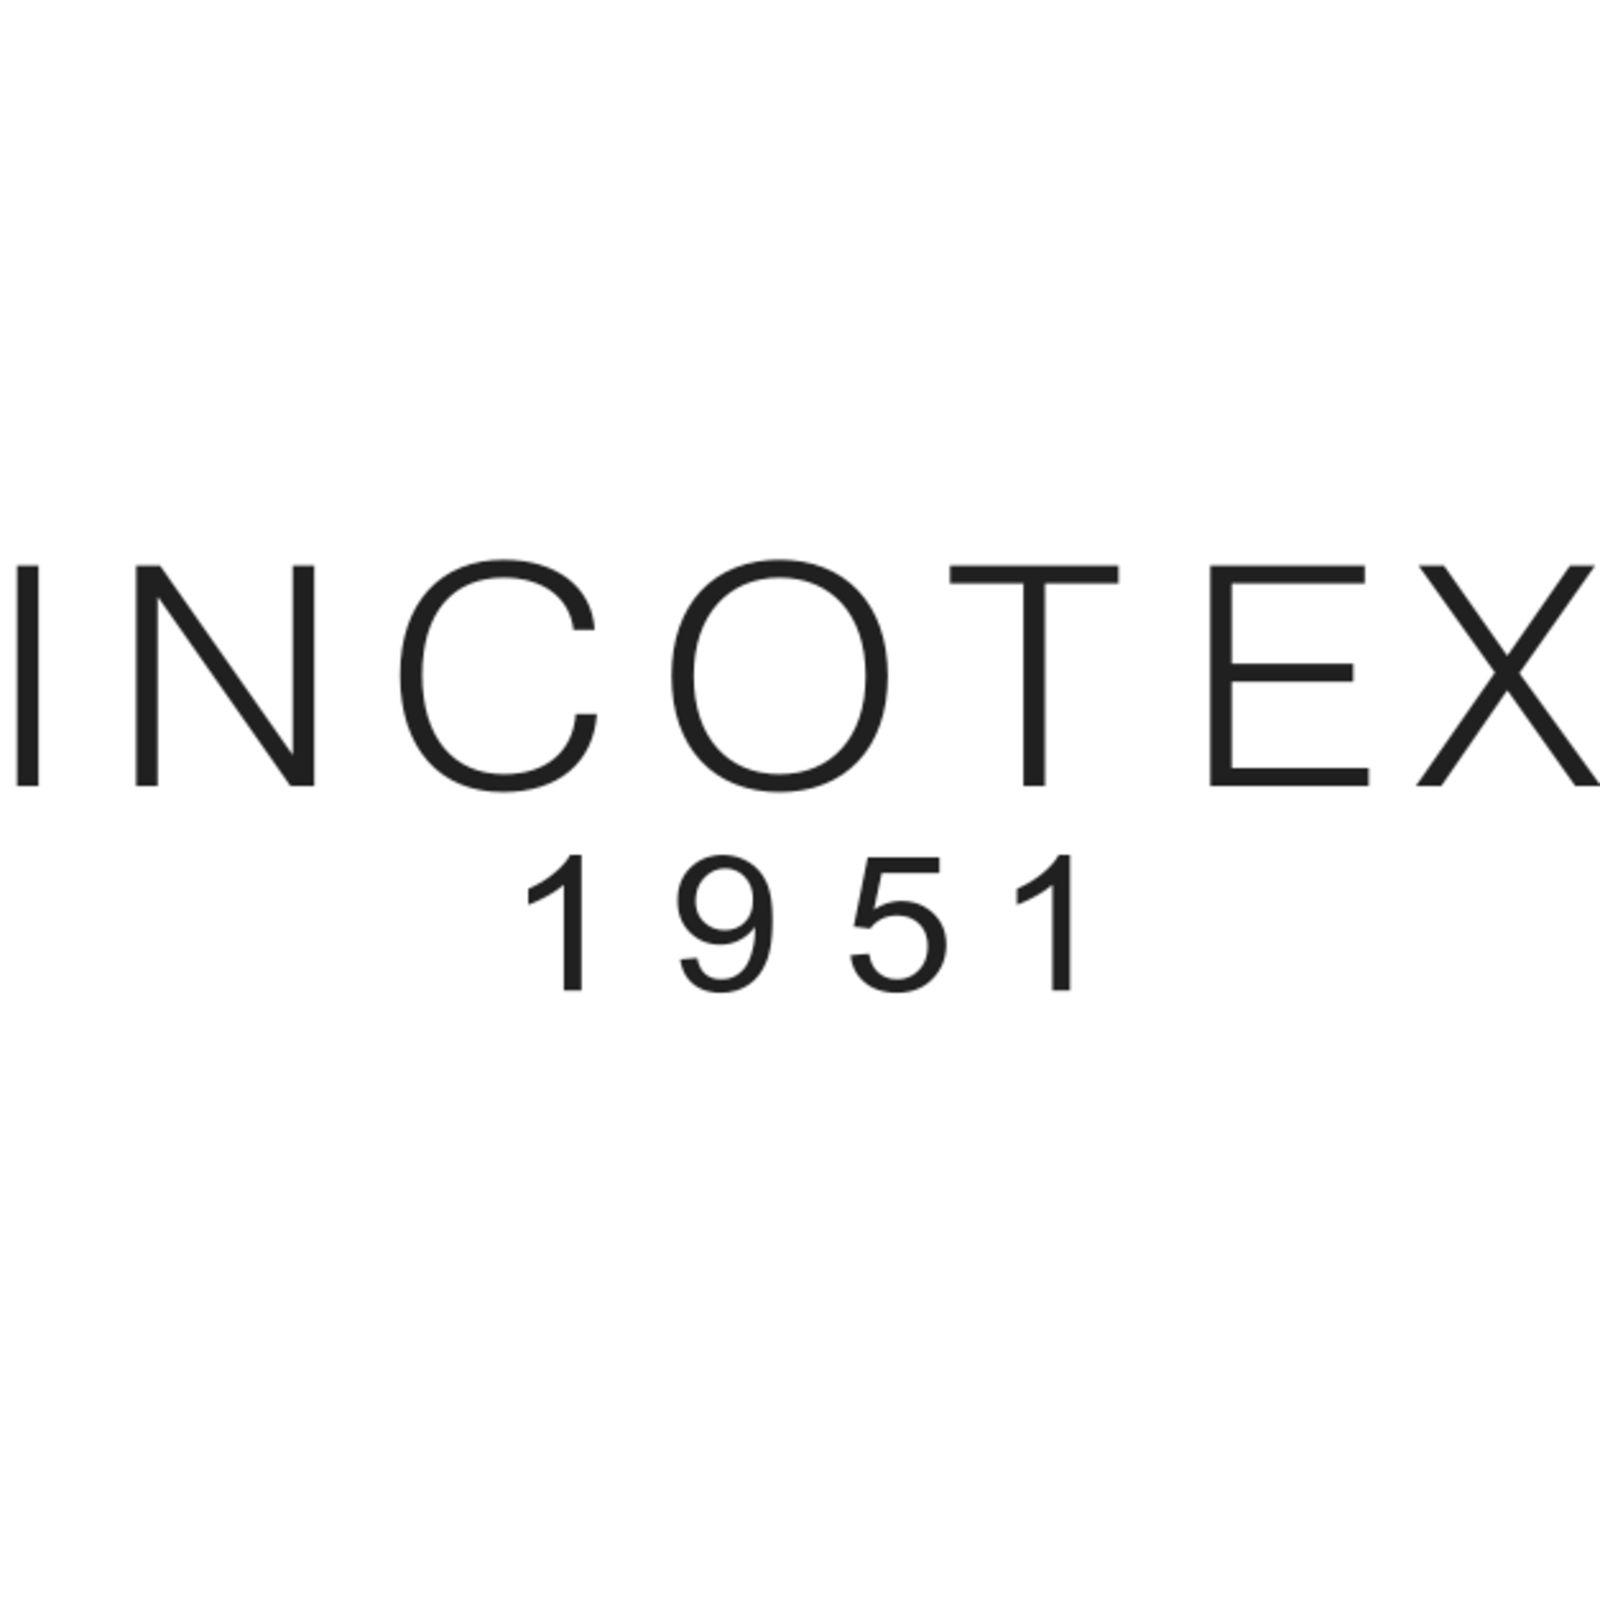 INCOTEX (Image 1)